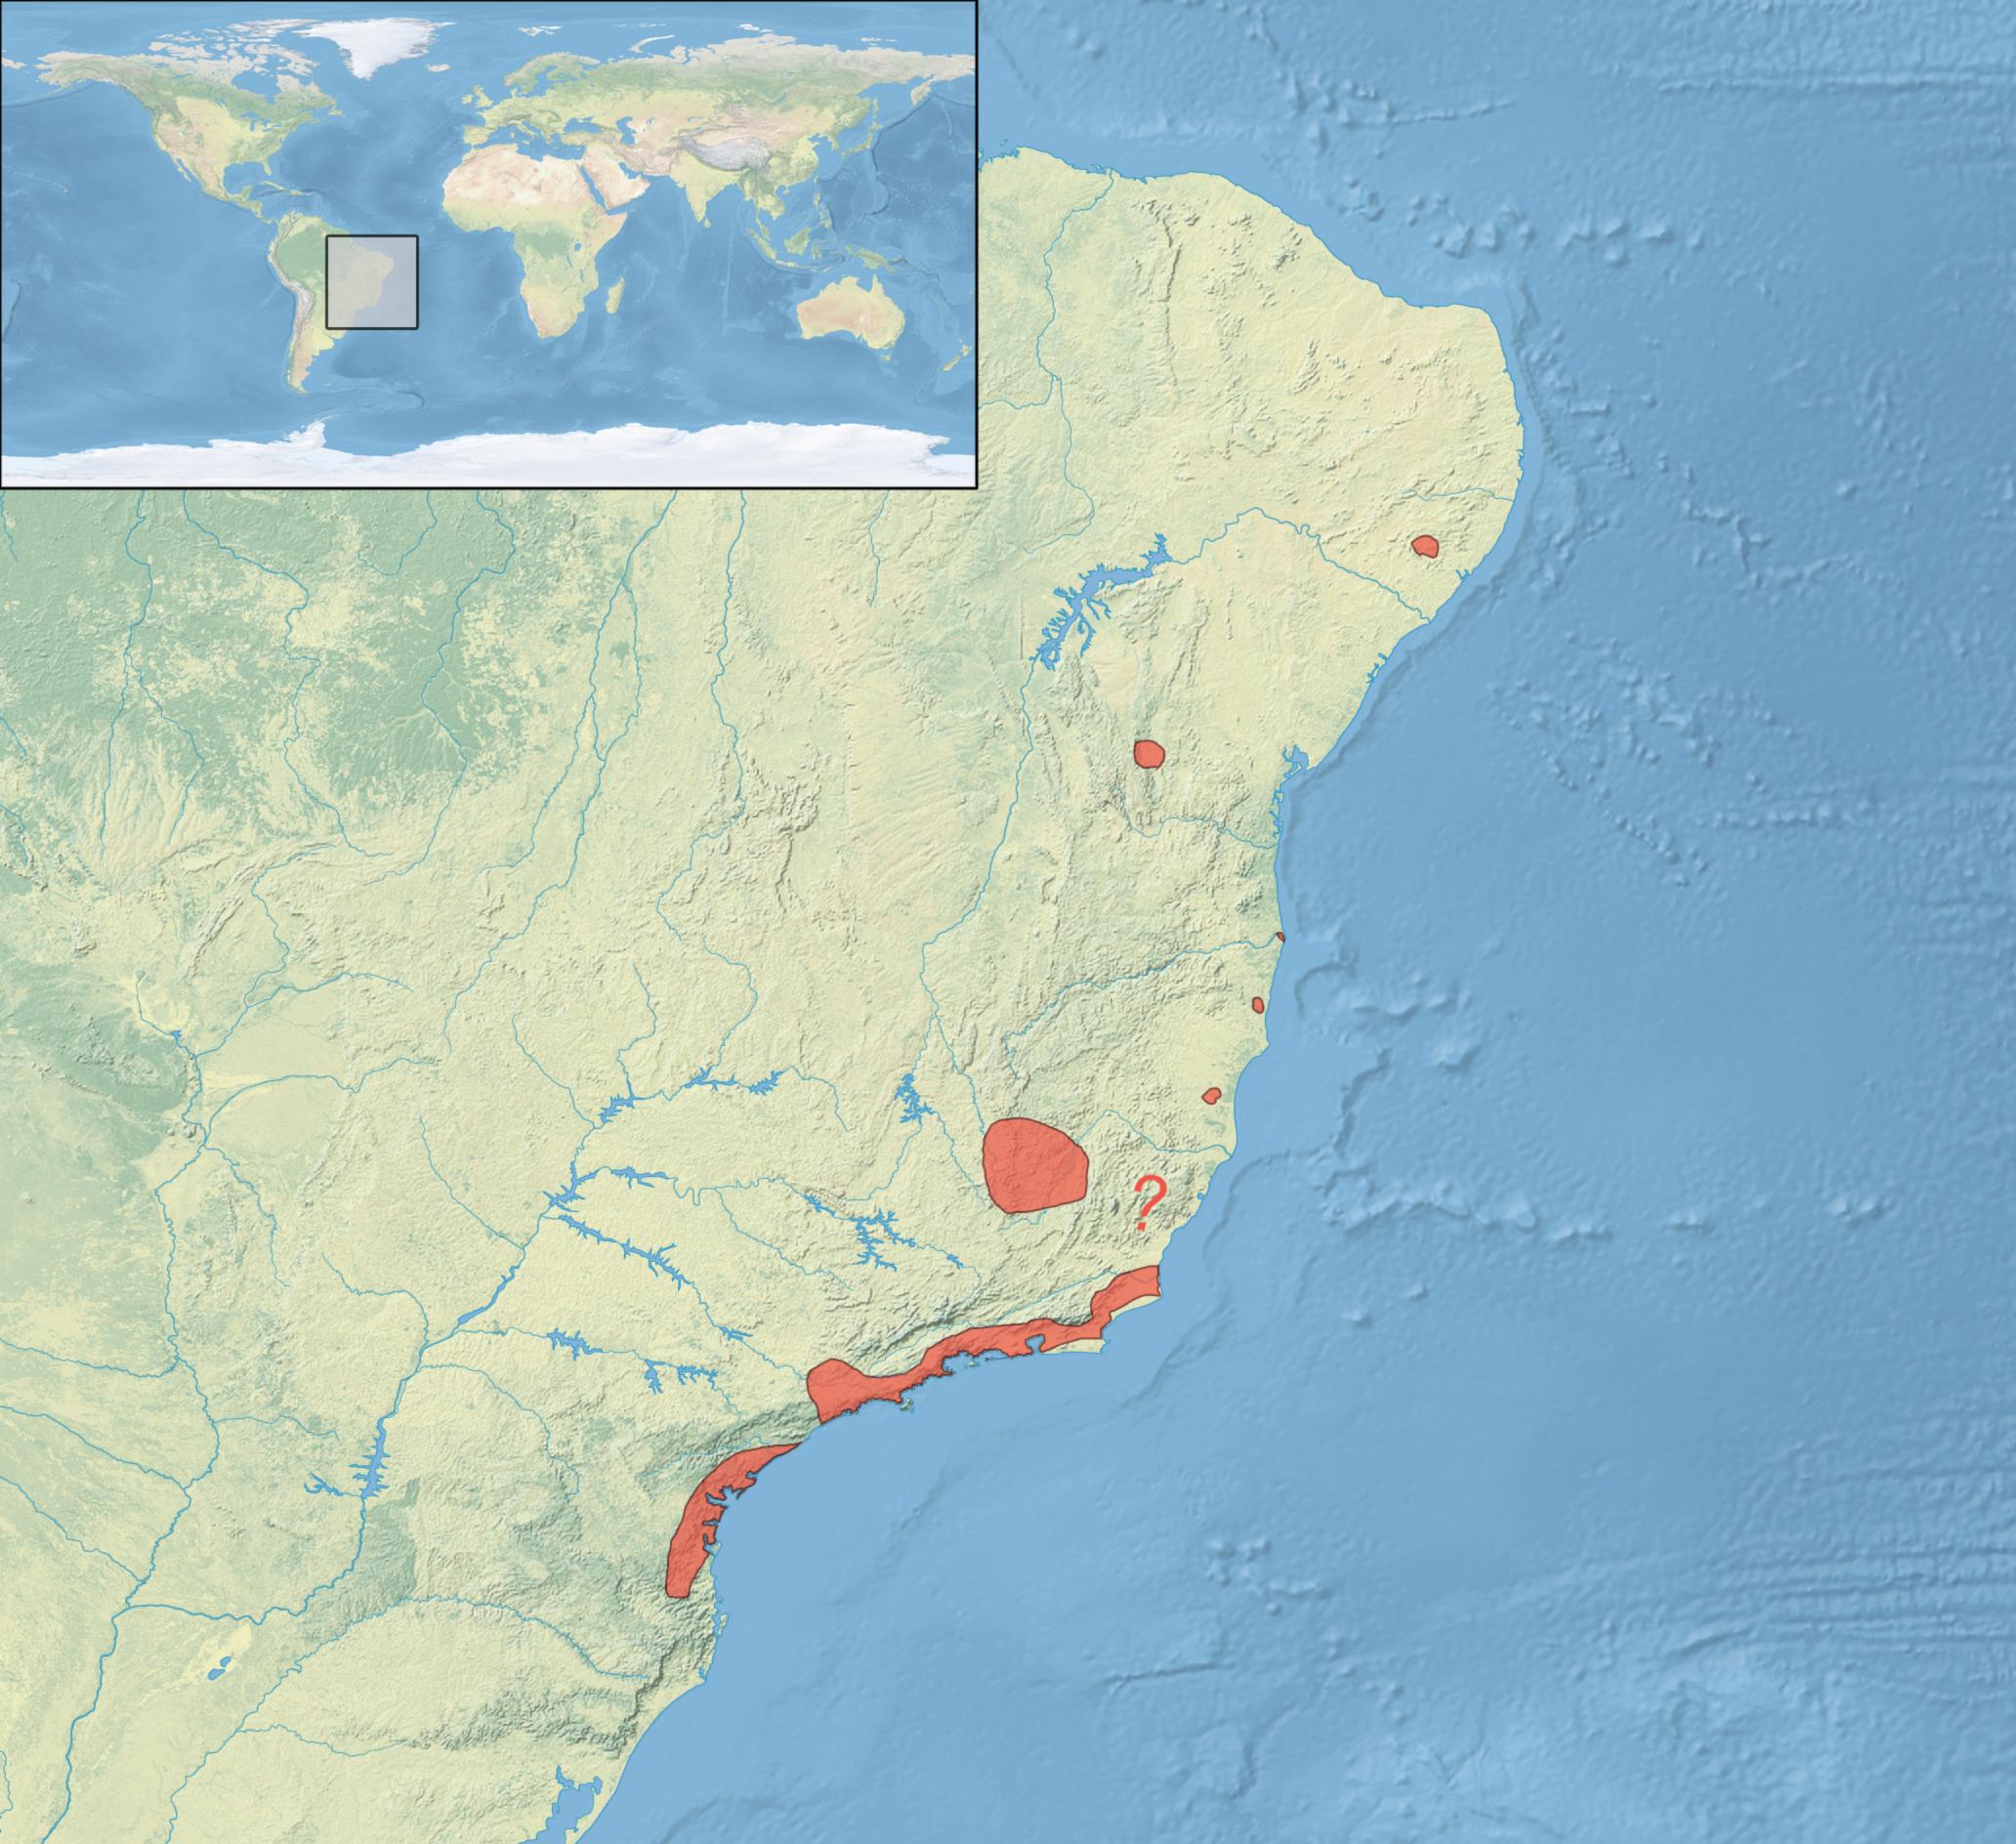 [Image: Leucopternis_lacernulata_distribution_map.png]